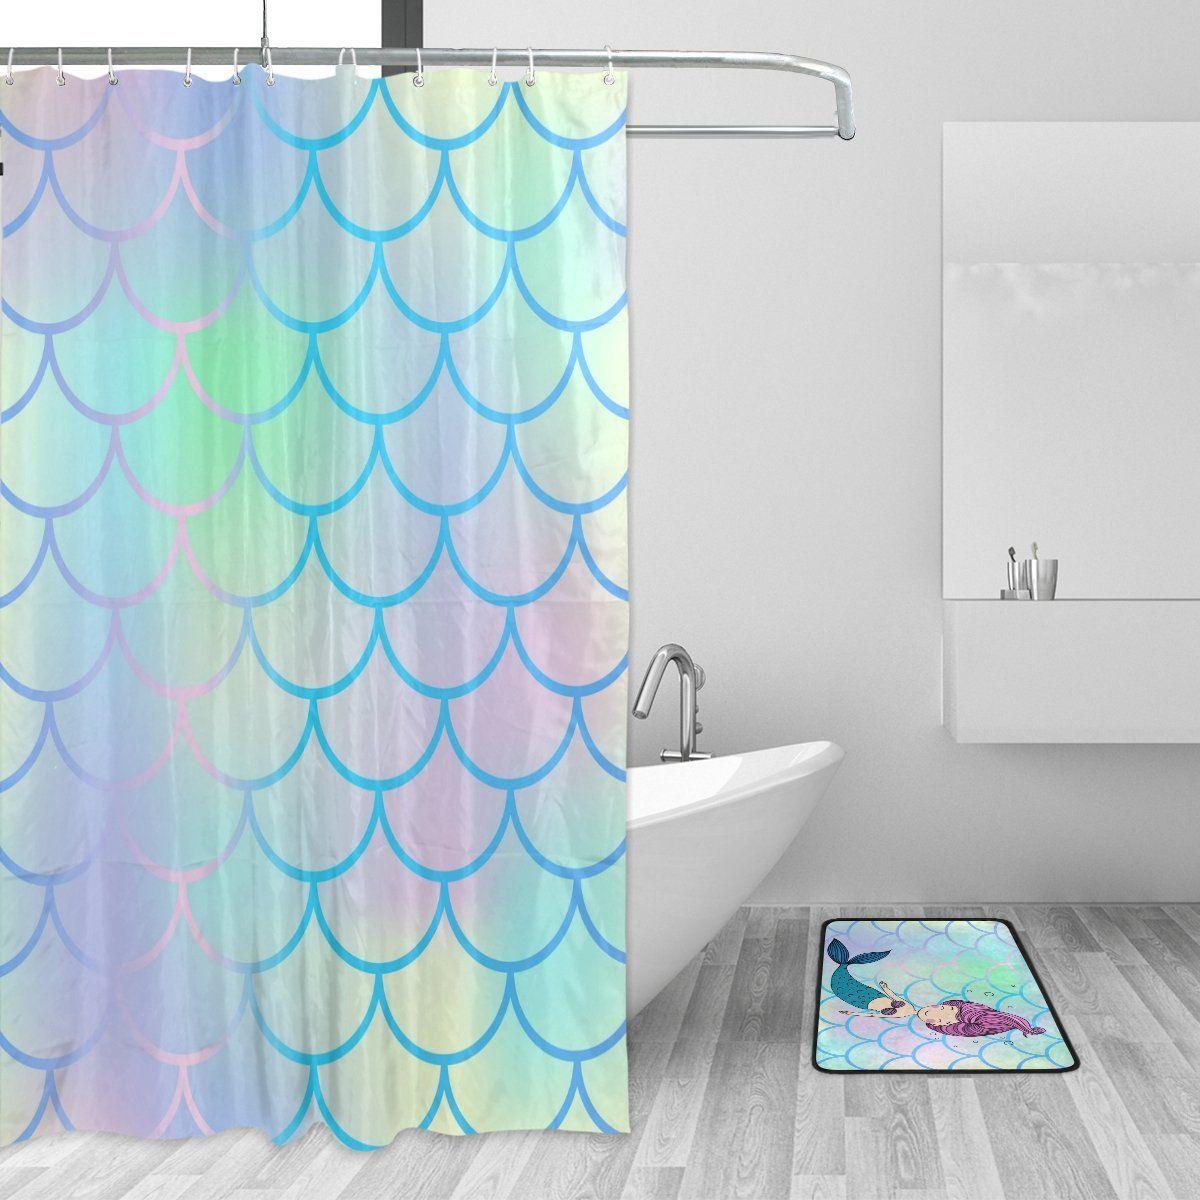 Pin On Home Mermaid bathroom decor amazon